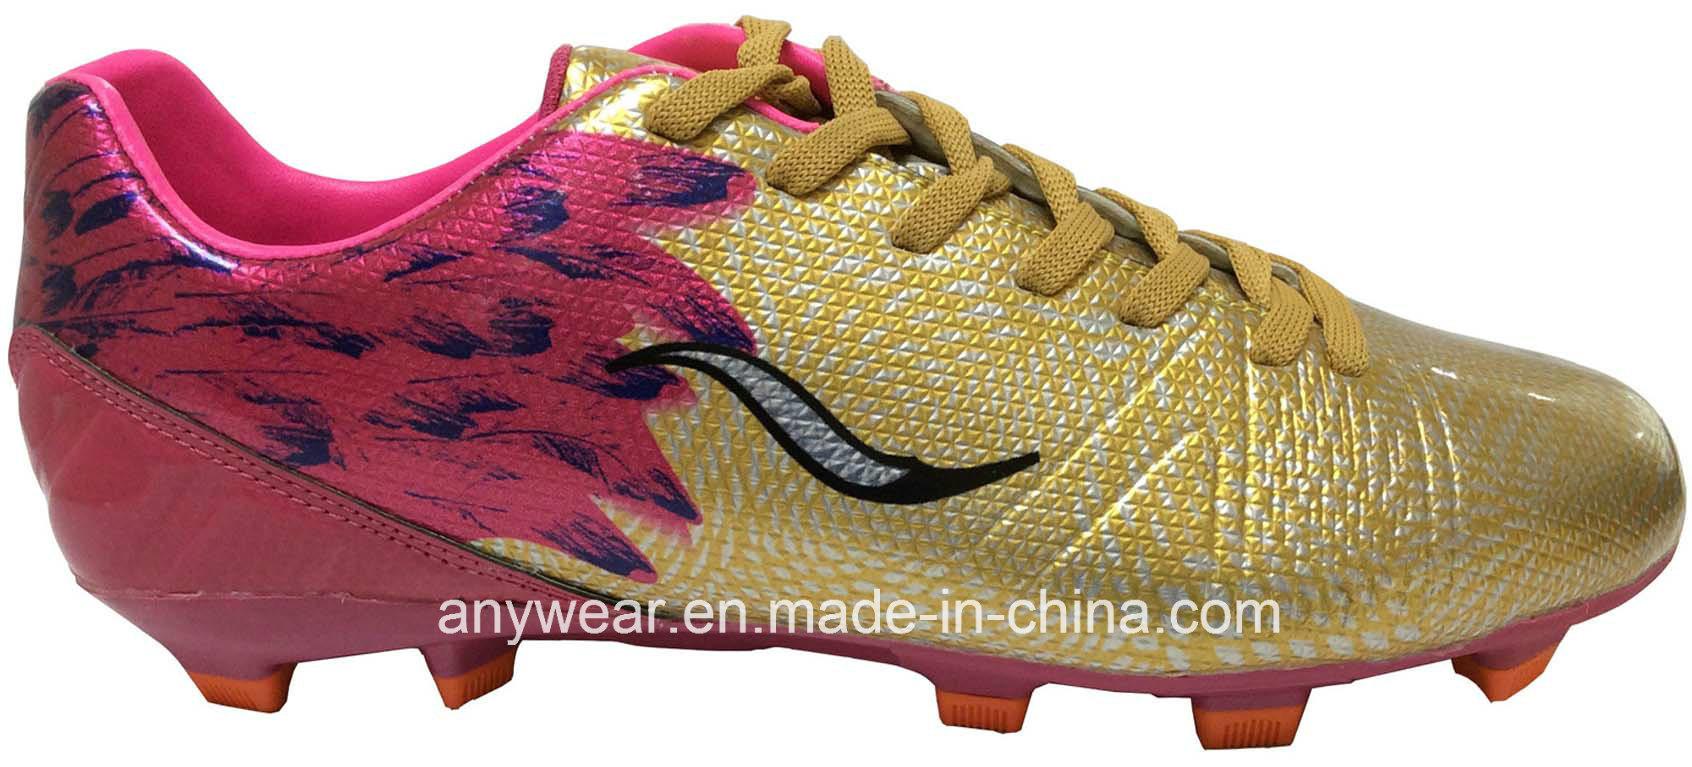 034fbdf98 China Men Sports Outdoor Soccer Boots Football Shoes (815-8533) - China Shoe,  Soccer Shoe